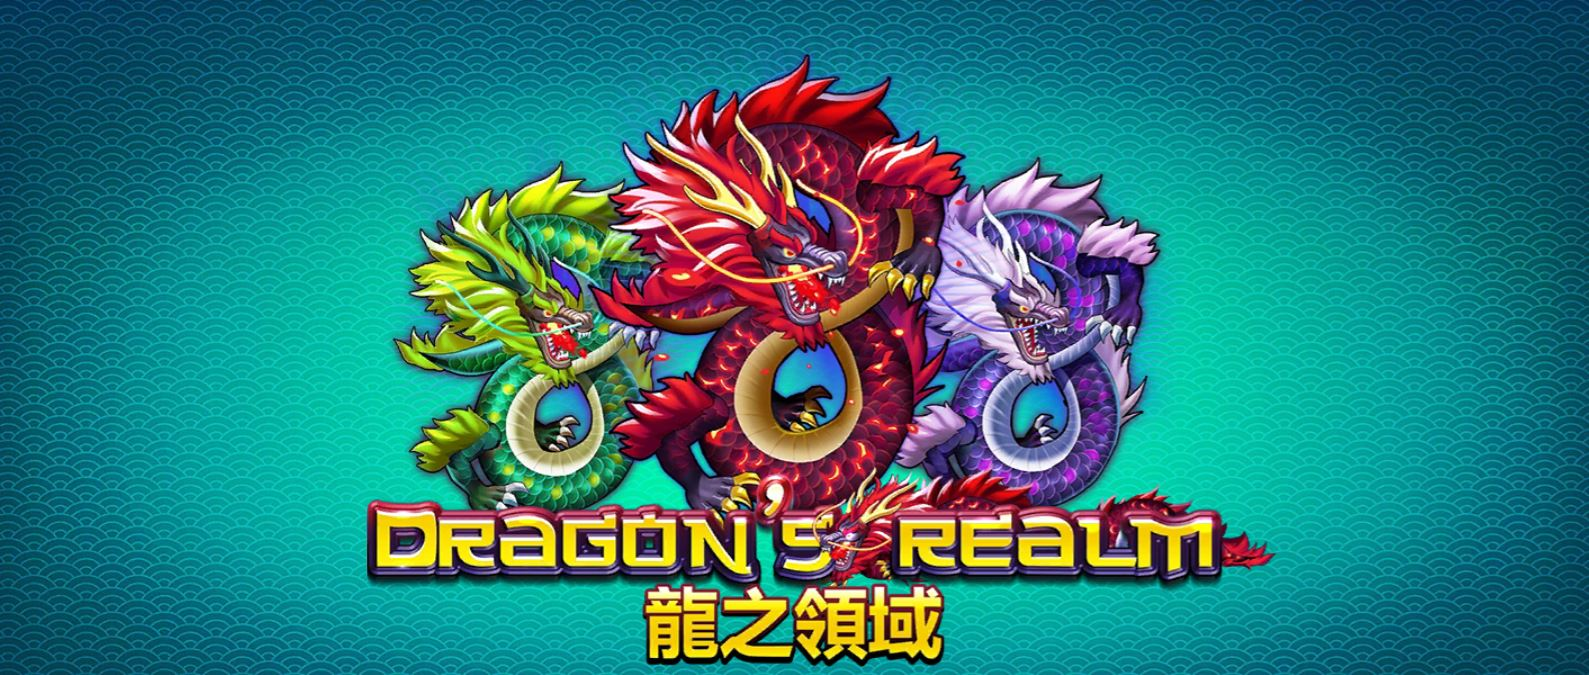 Slotxo-Dragons realm-สมัคร